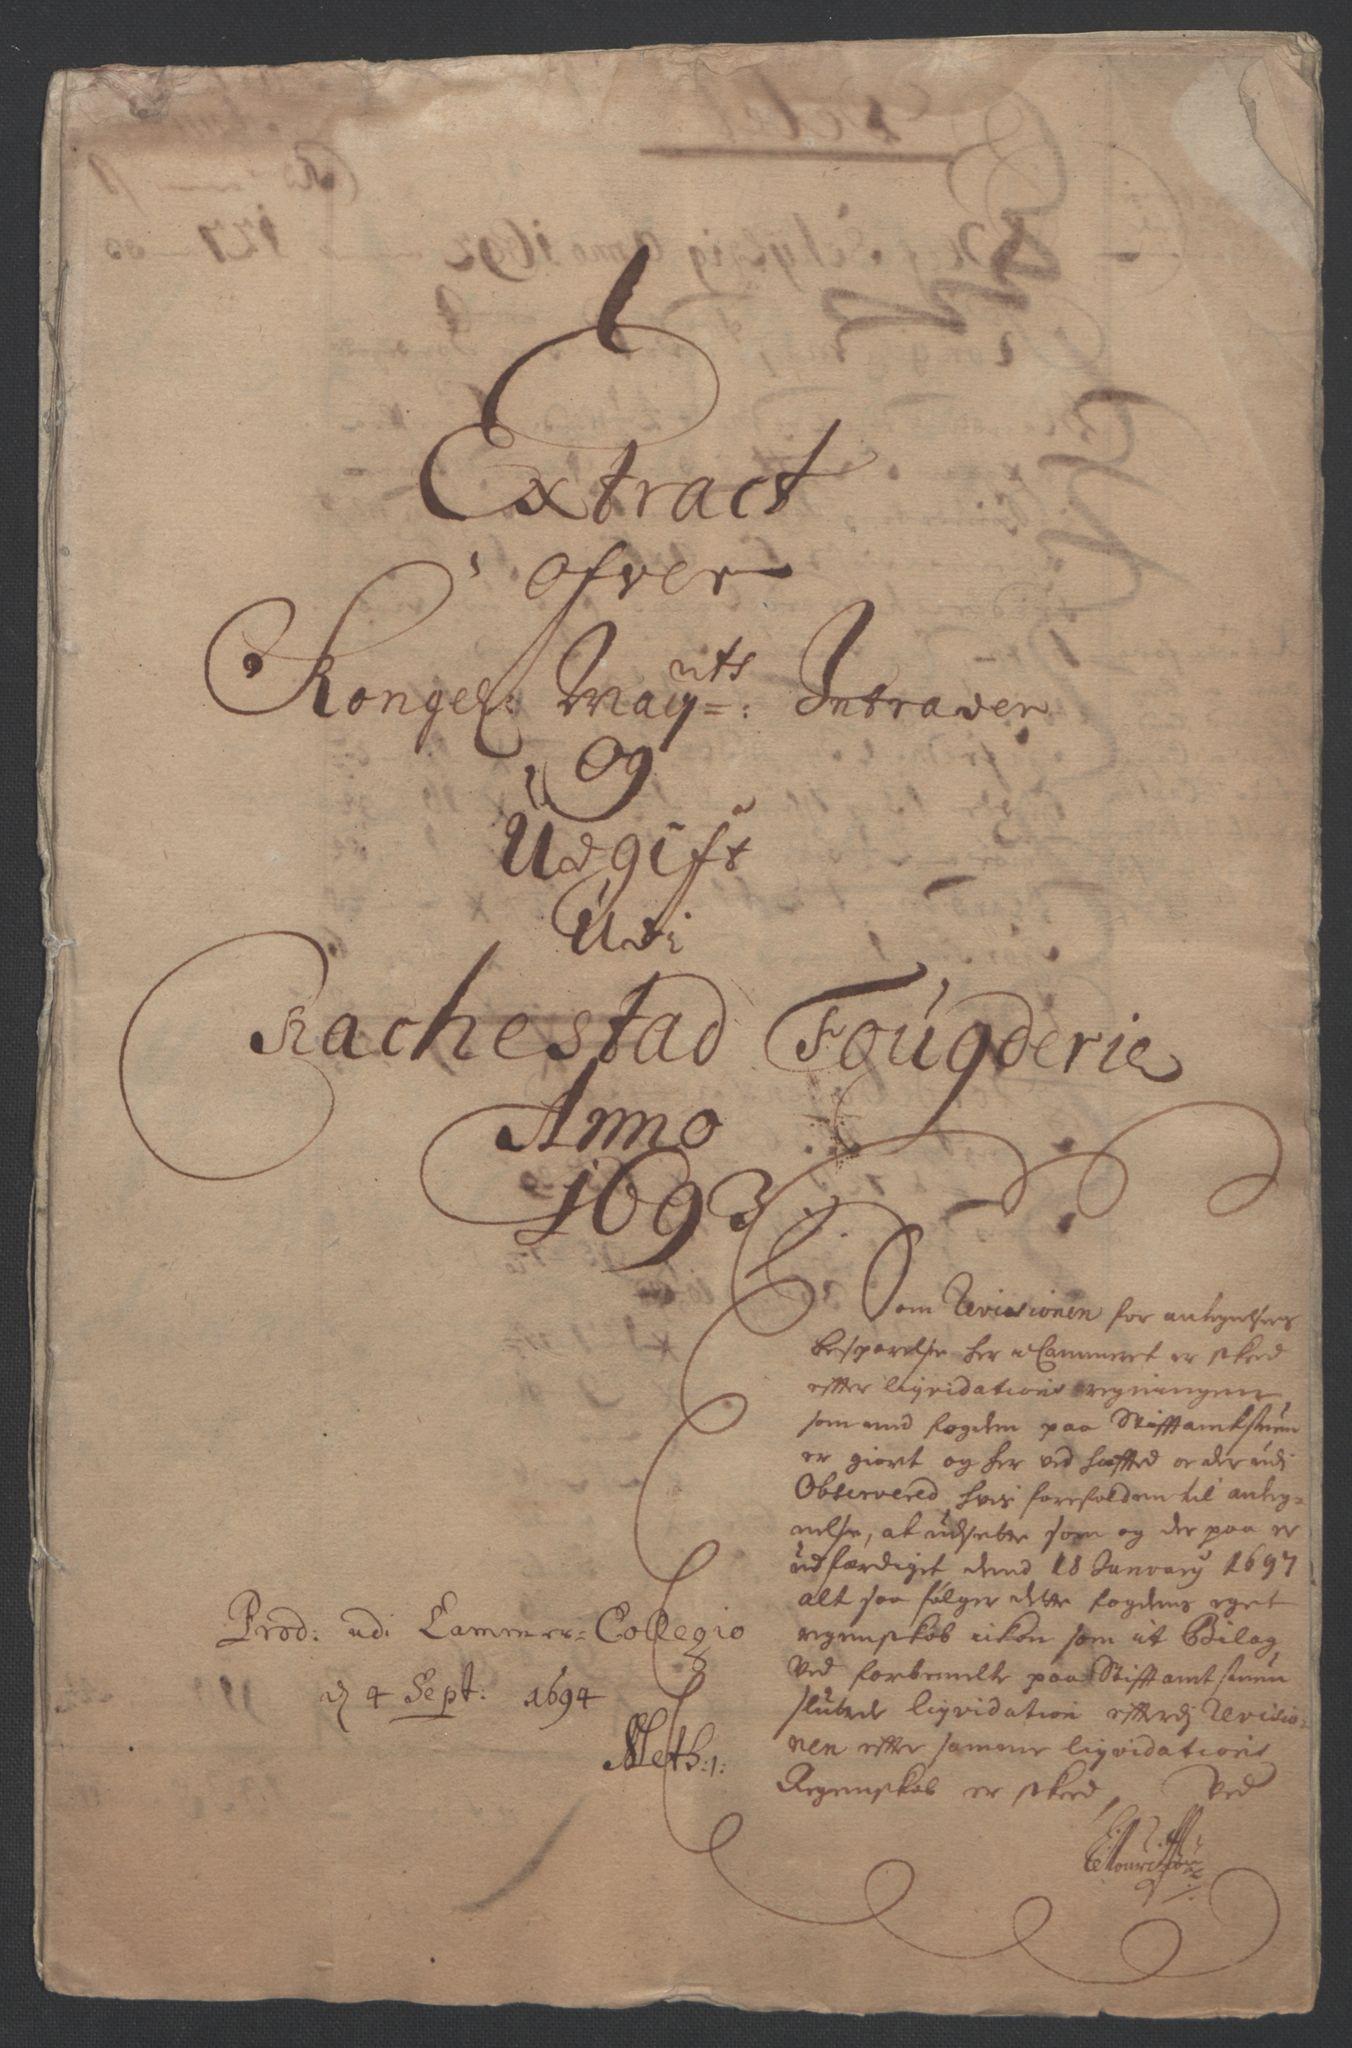 RA, Rentekammeret inntil 1814, Reviderte regnskaper, Fogderegnskap, R05/L0278: Fogderegnskap Rakkestad, 1691-1693, s. 346